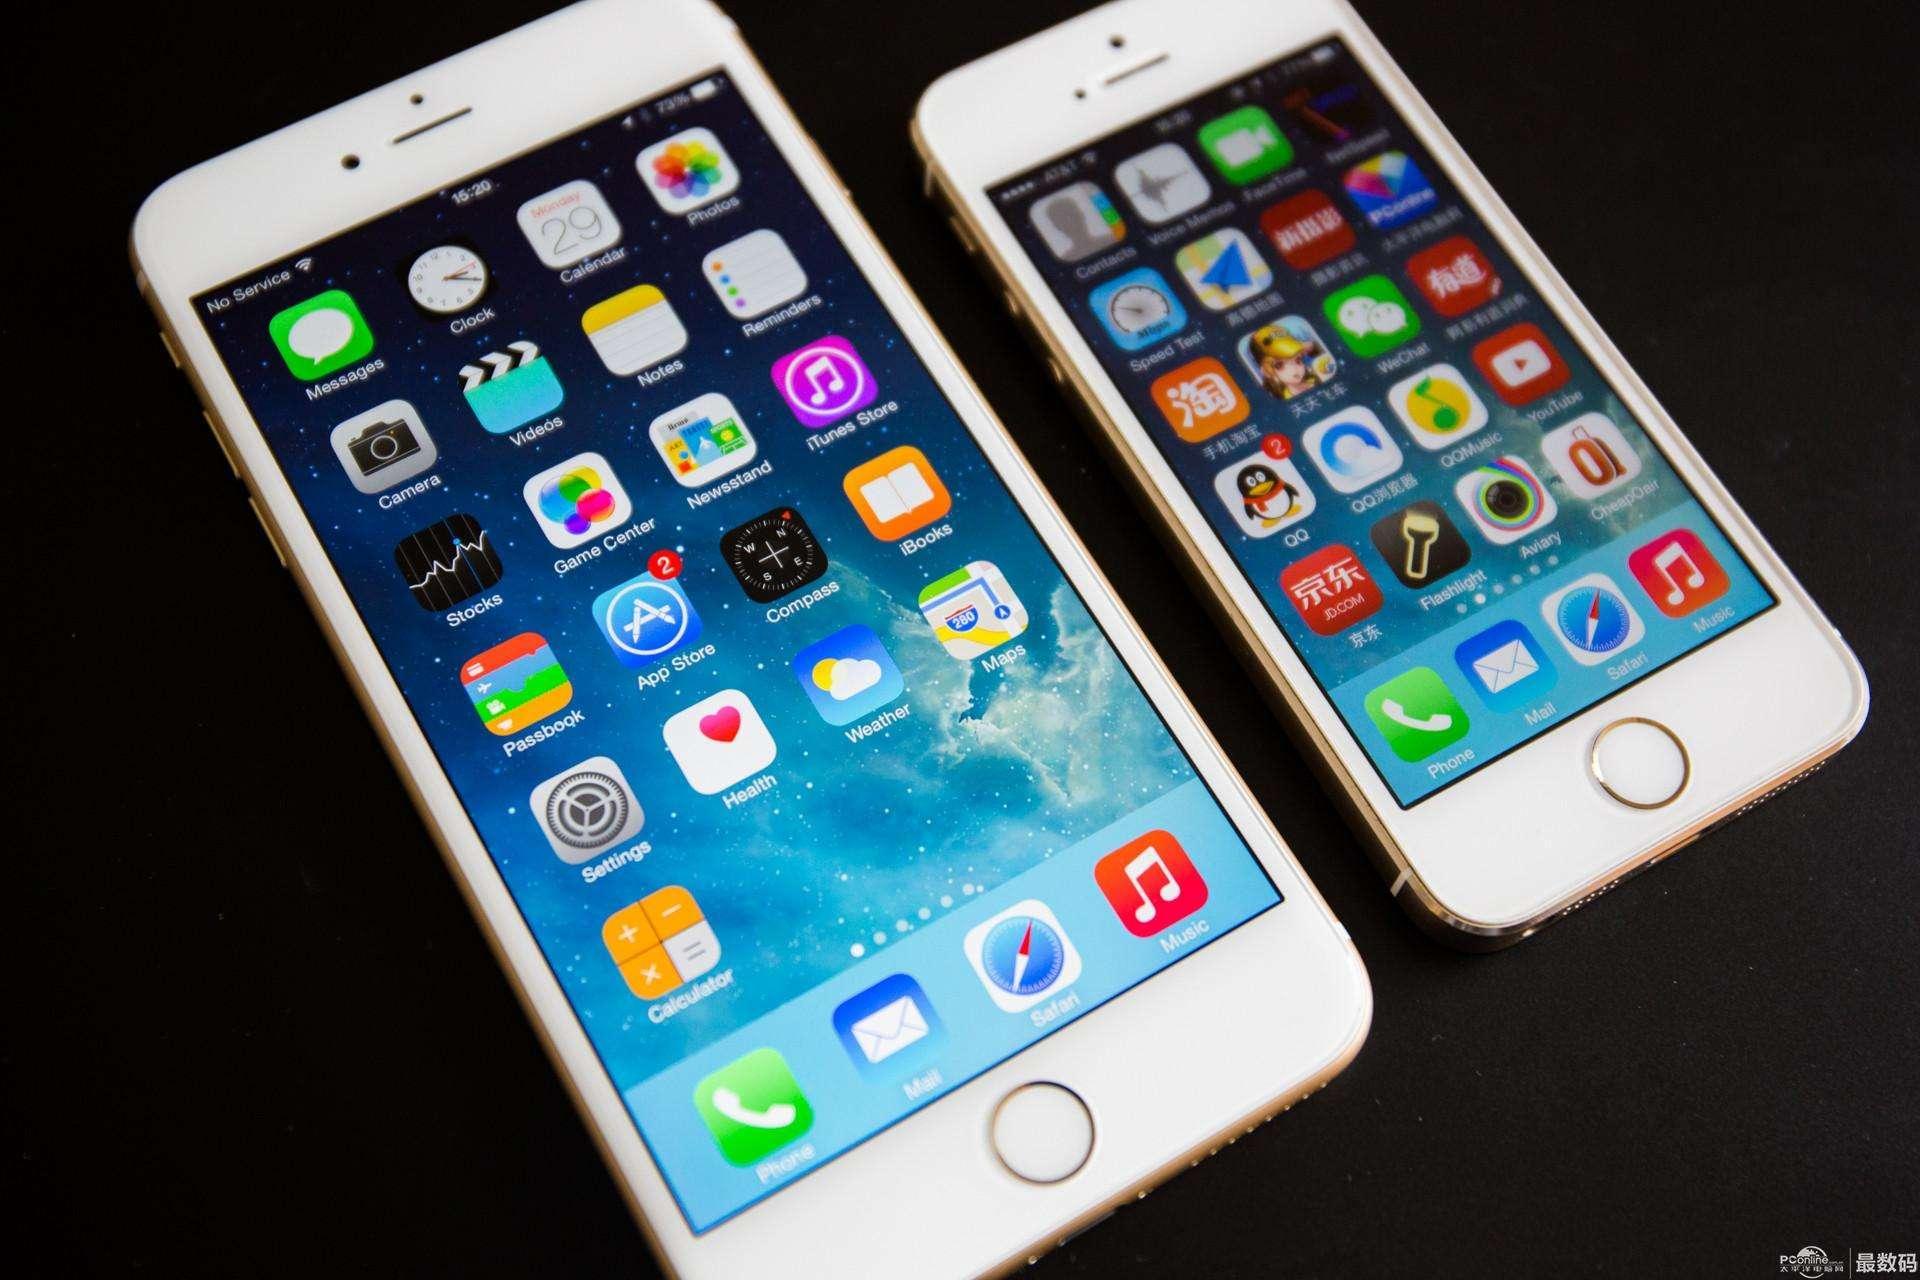 6plus品牌手機模型,道具手機,展示手機,模具模型機 7